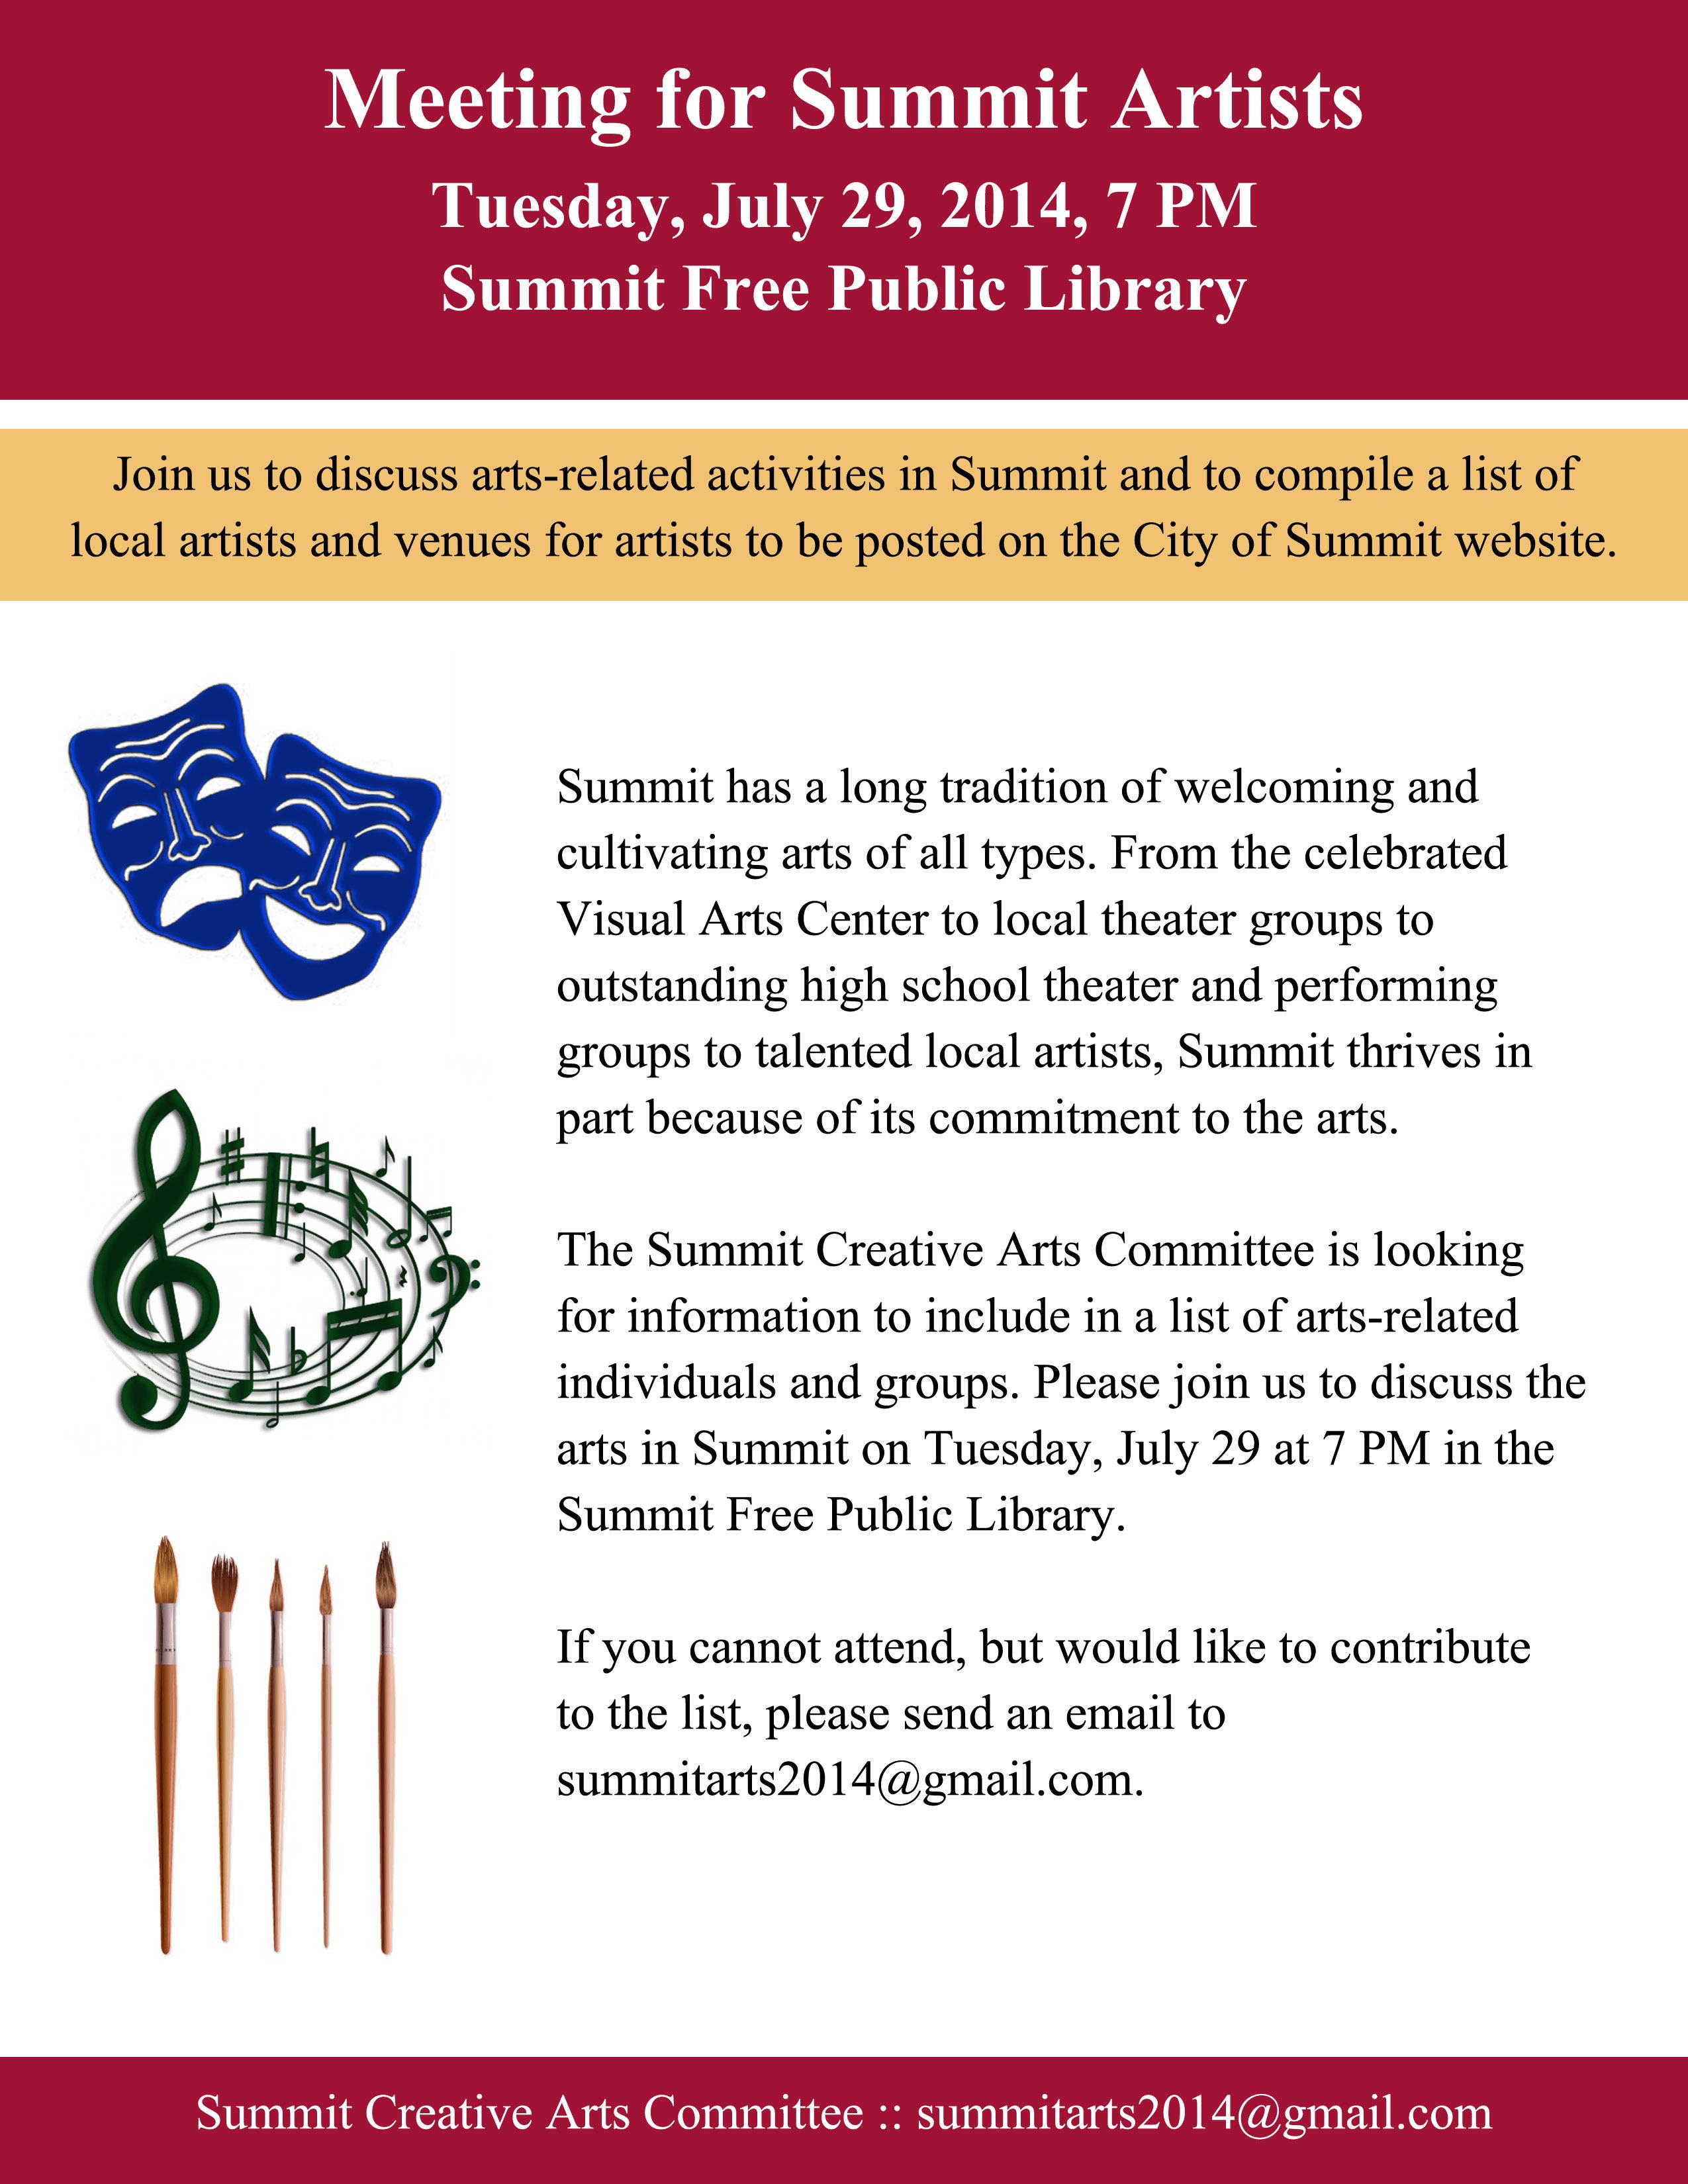 d5d7aedfe1e0f6963a1f_summit_creative_arts_meeting_flyer.jpg